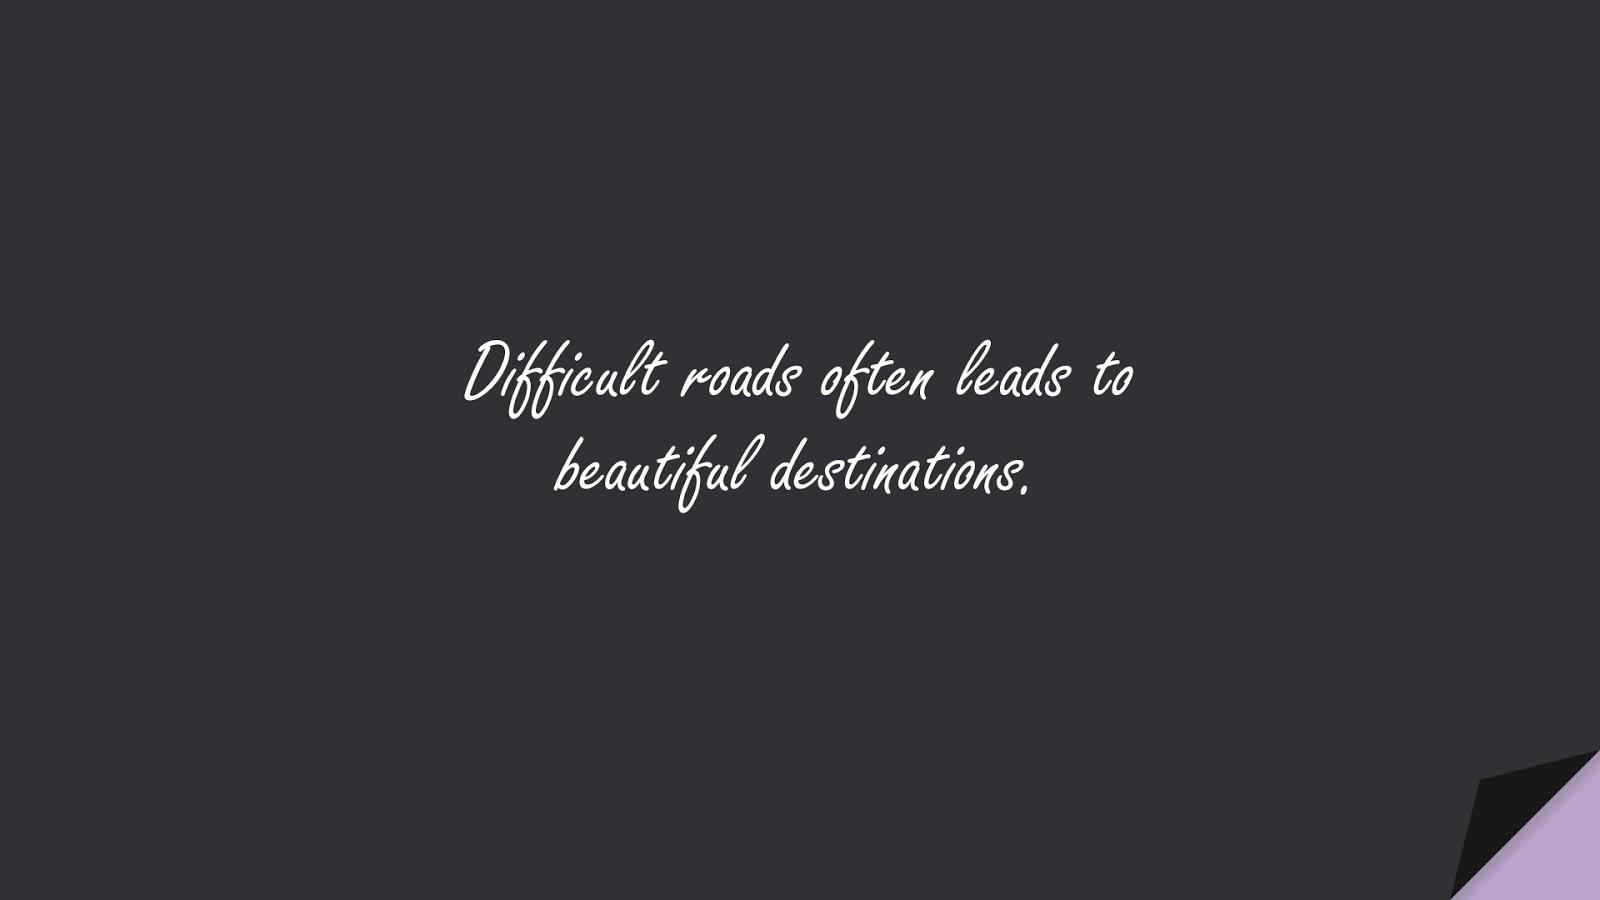 Difficult roads often leads to beautiful destinations.FALSE